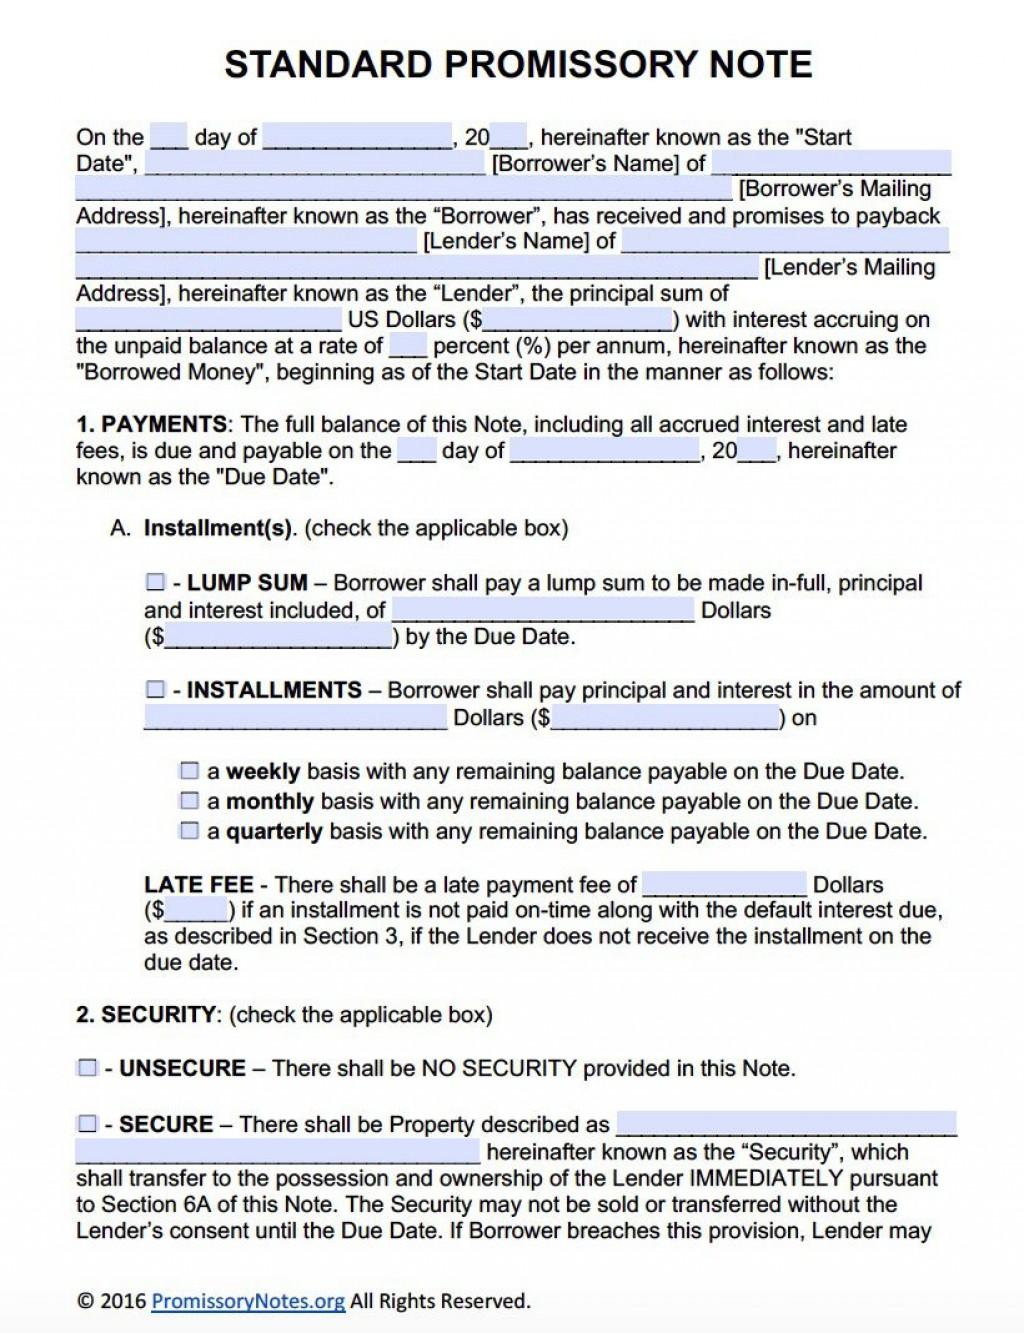 009 Sensational Blank Promissory Note Template Concept  Form Free DownloadLarge